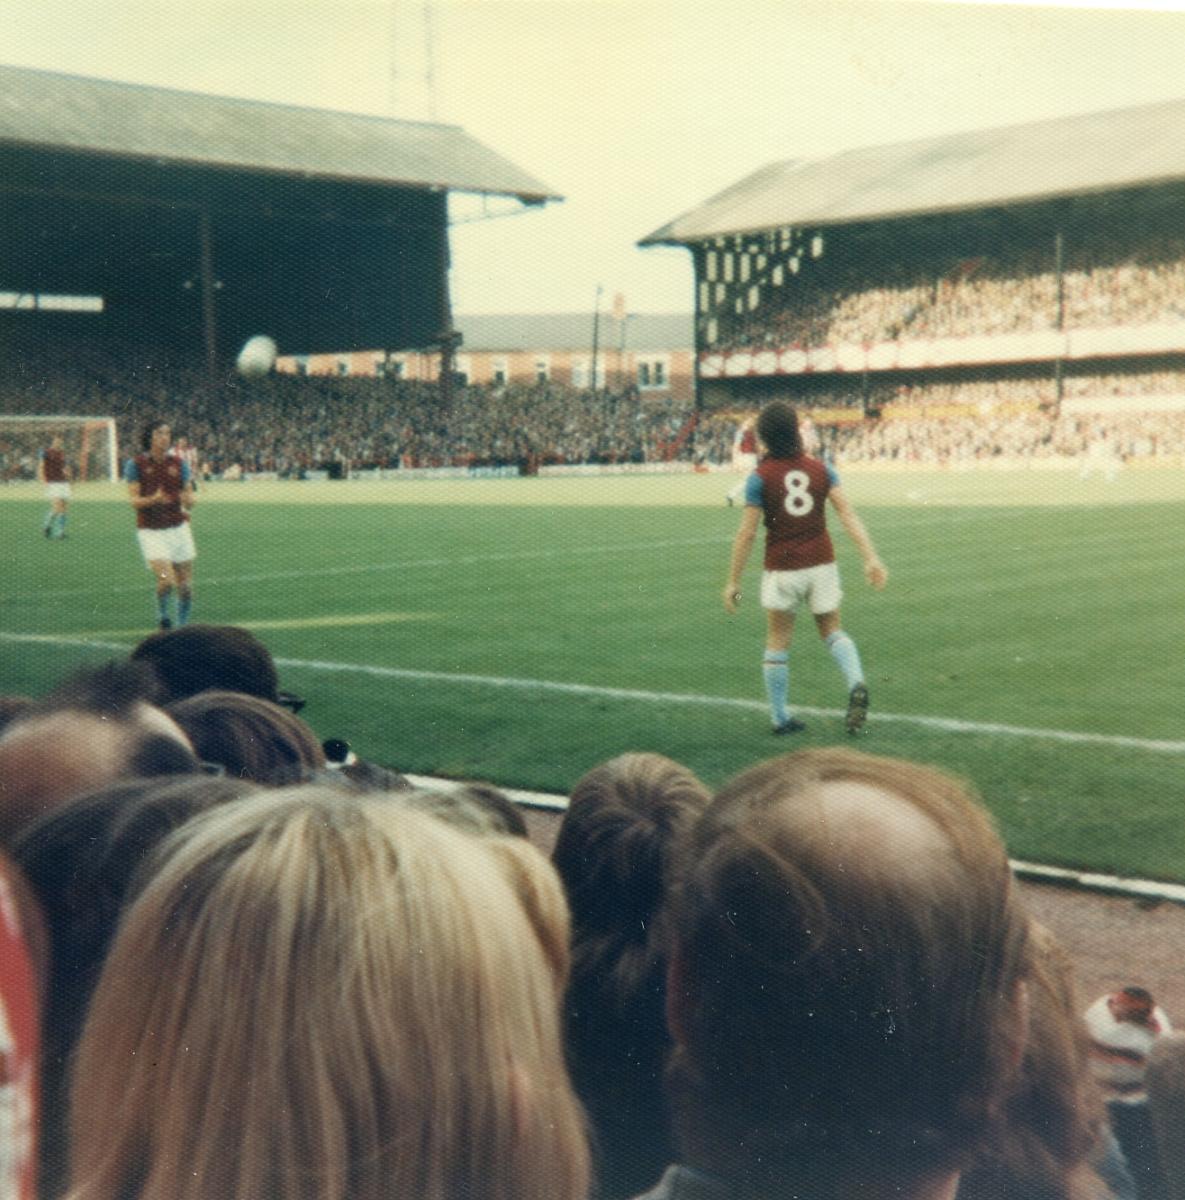 Sunderland A  1-0 to us1976